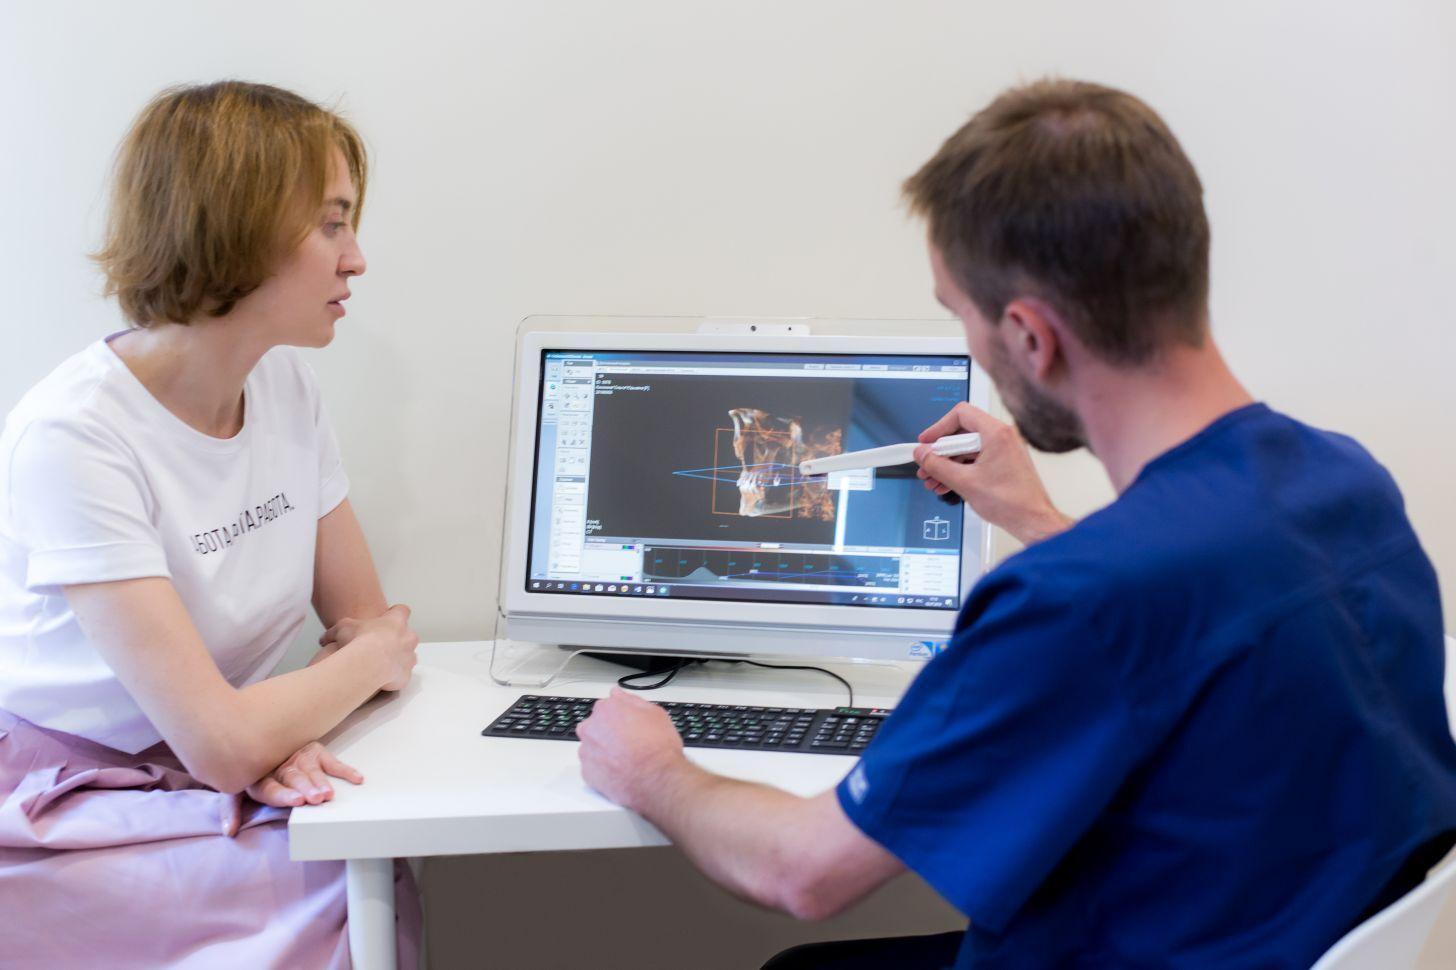 Компьютерная диагностика шишки на десне